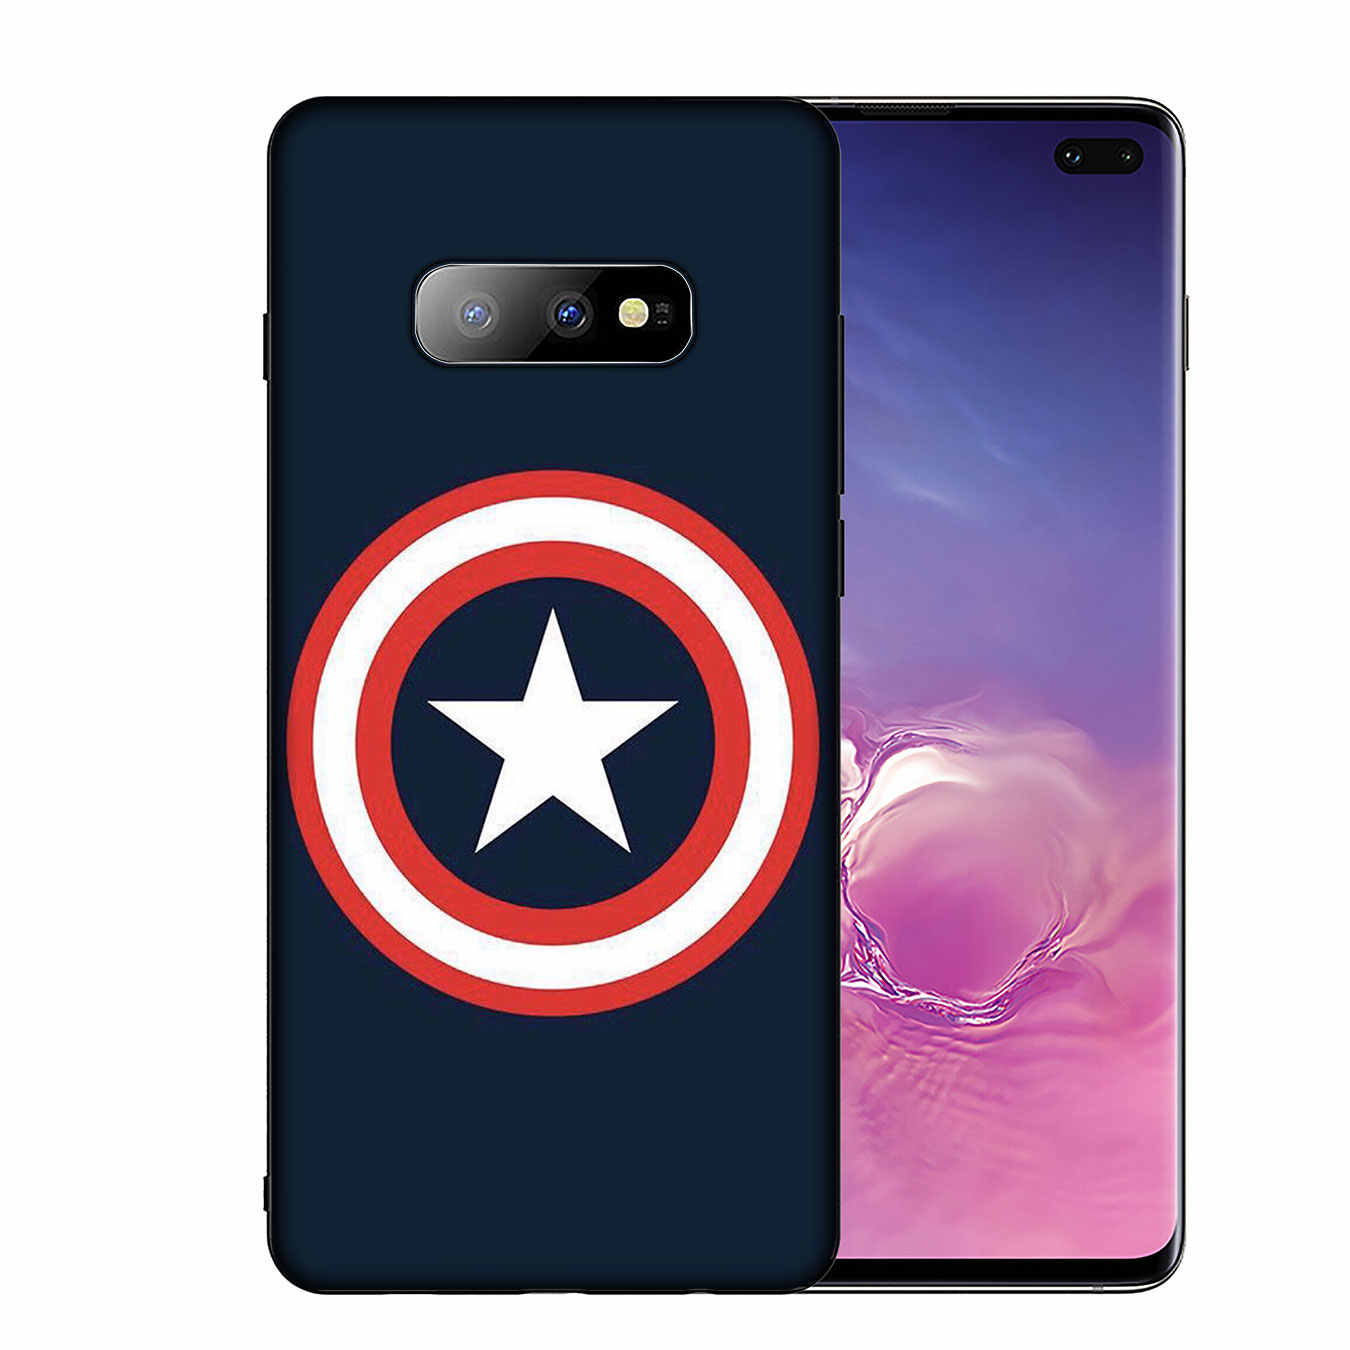 IYICAO The Avengers Superhero Caso de Telefone de Silicone Macio para Samsung Galaxy S20 Ultra Lite S10 S9 S8 Plus S6 S7 Borda S10e Capa